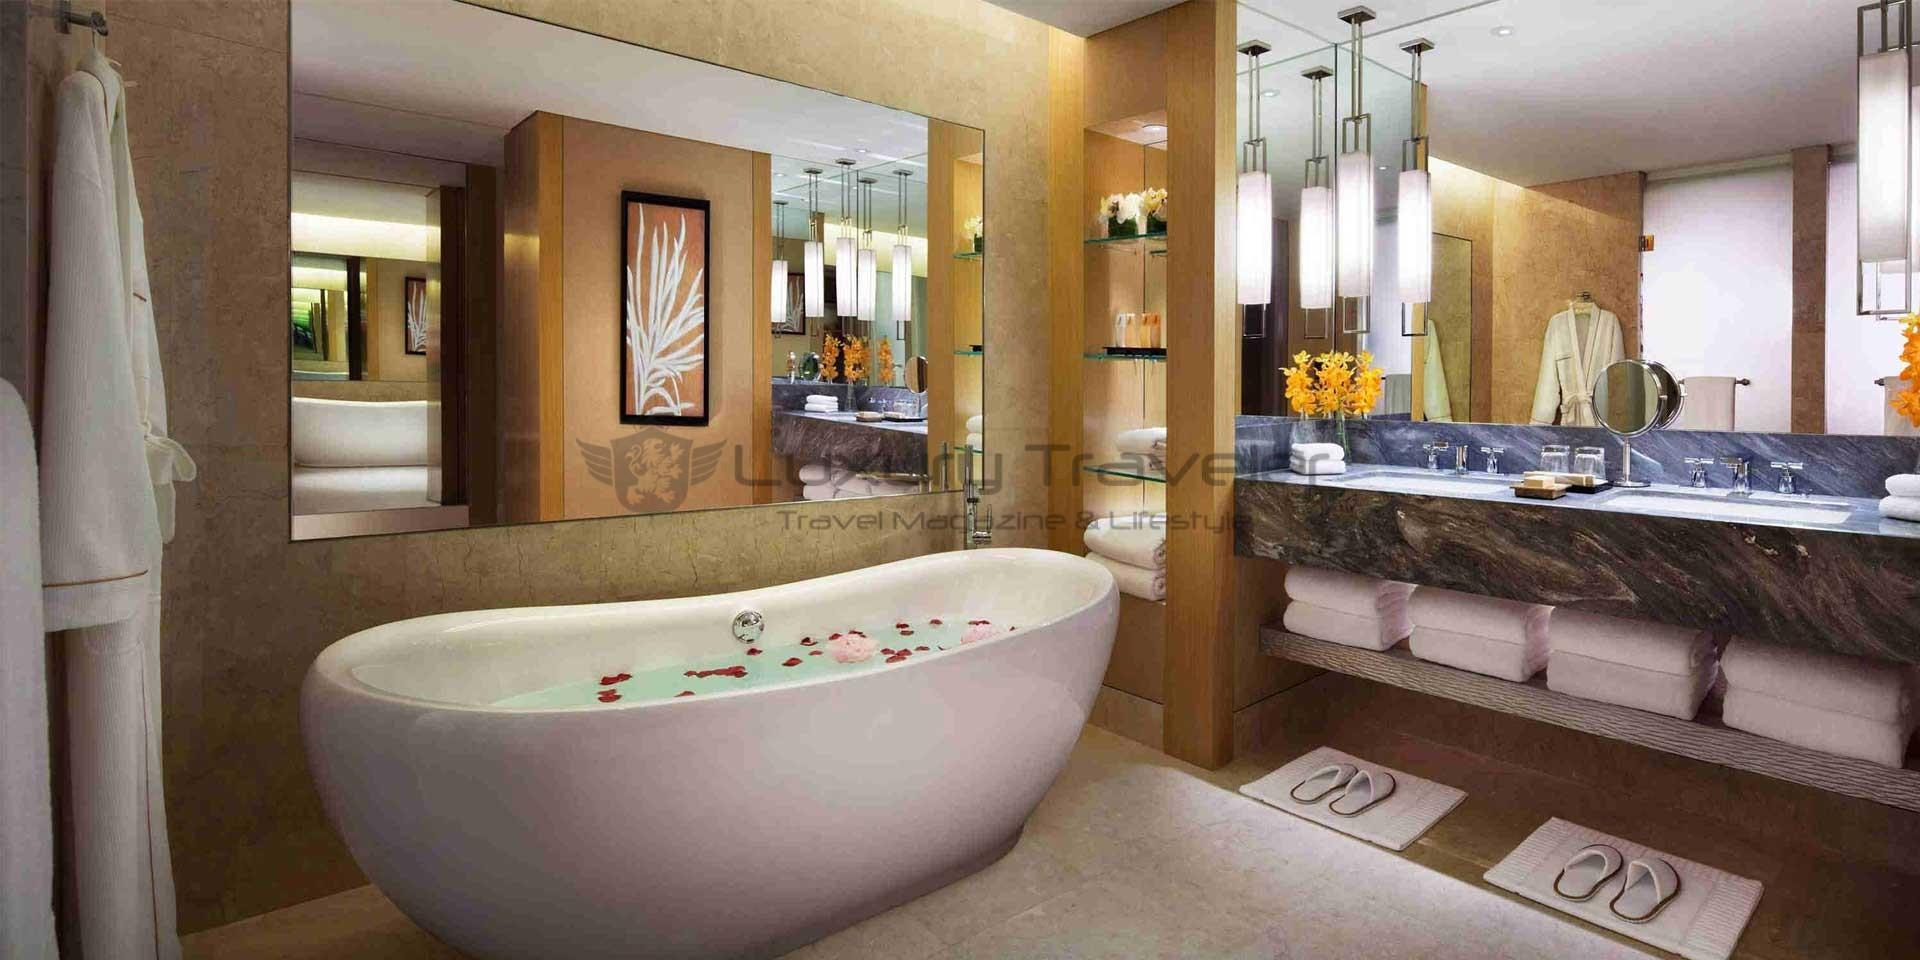 marina_bay_sands_singapore_Marina-Bay-Sands-bathroom_hotel